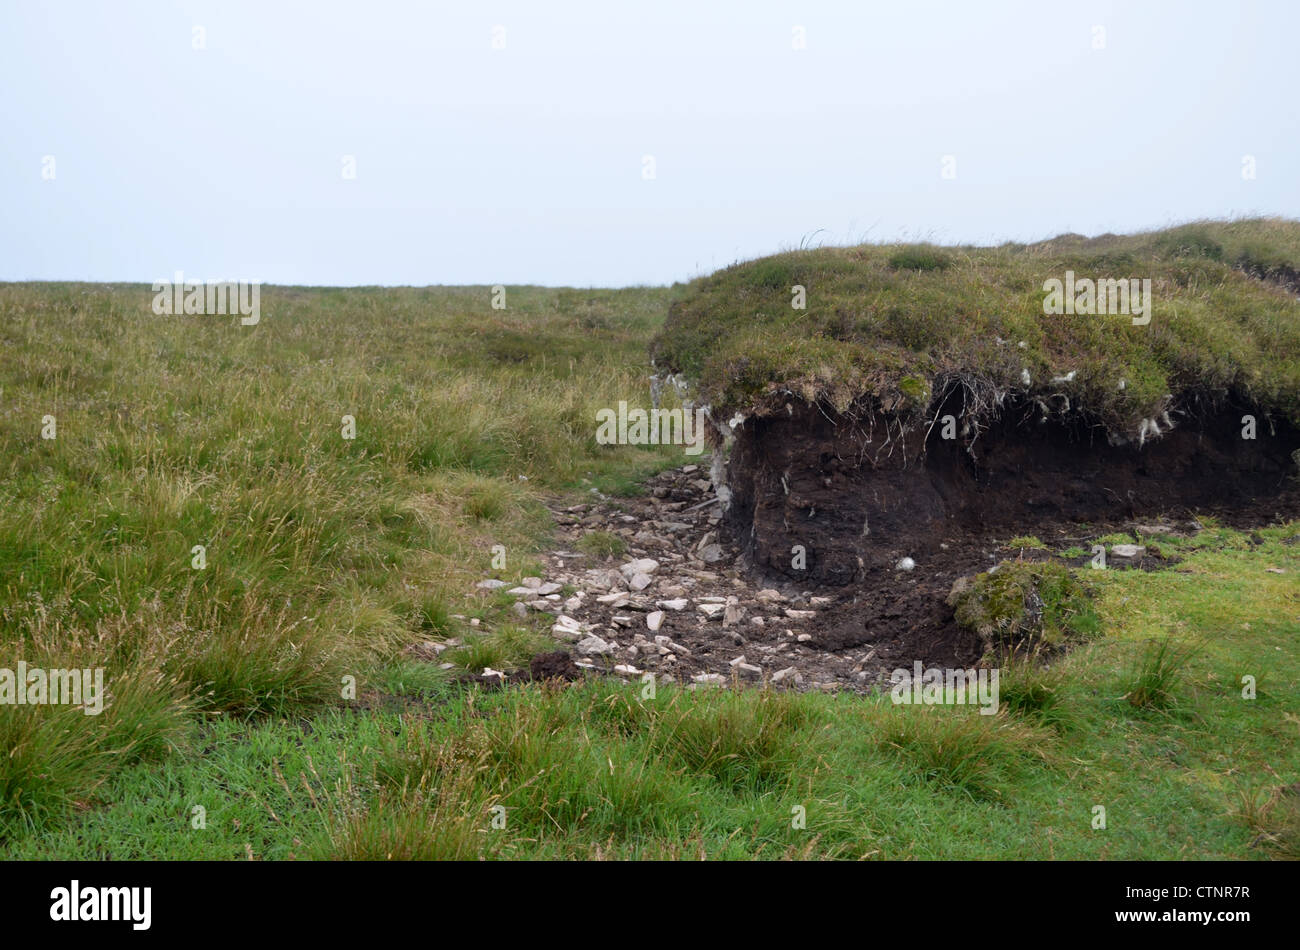 wind erosion number 3190 - Stock Image